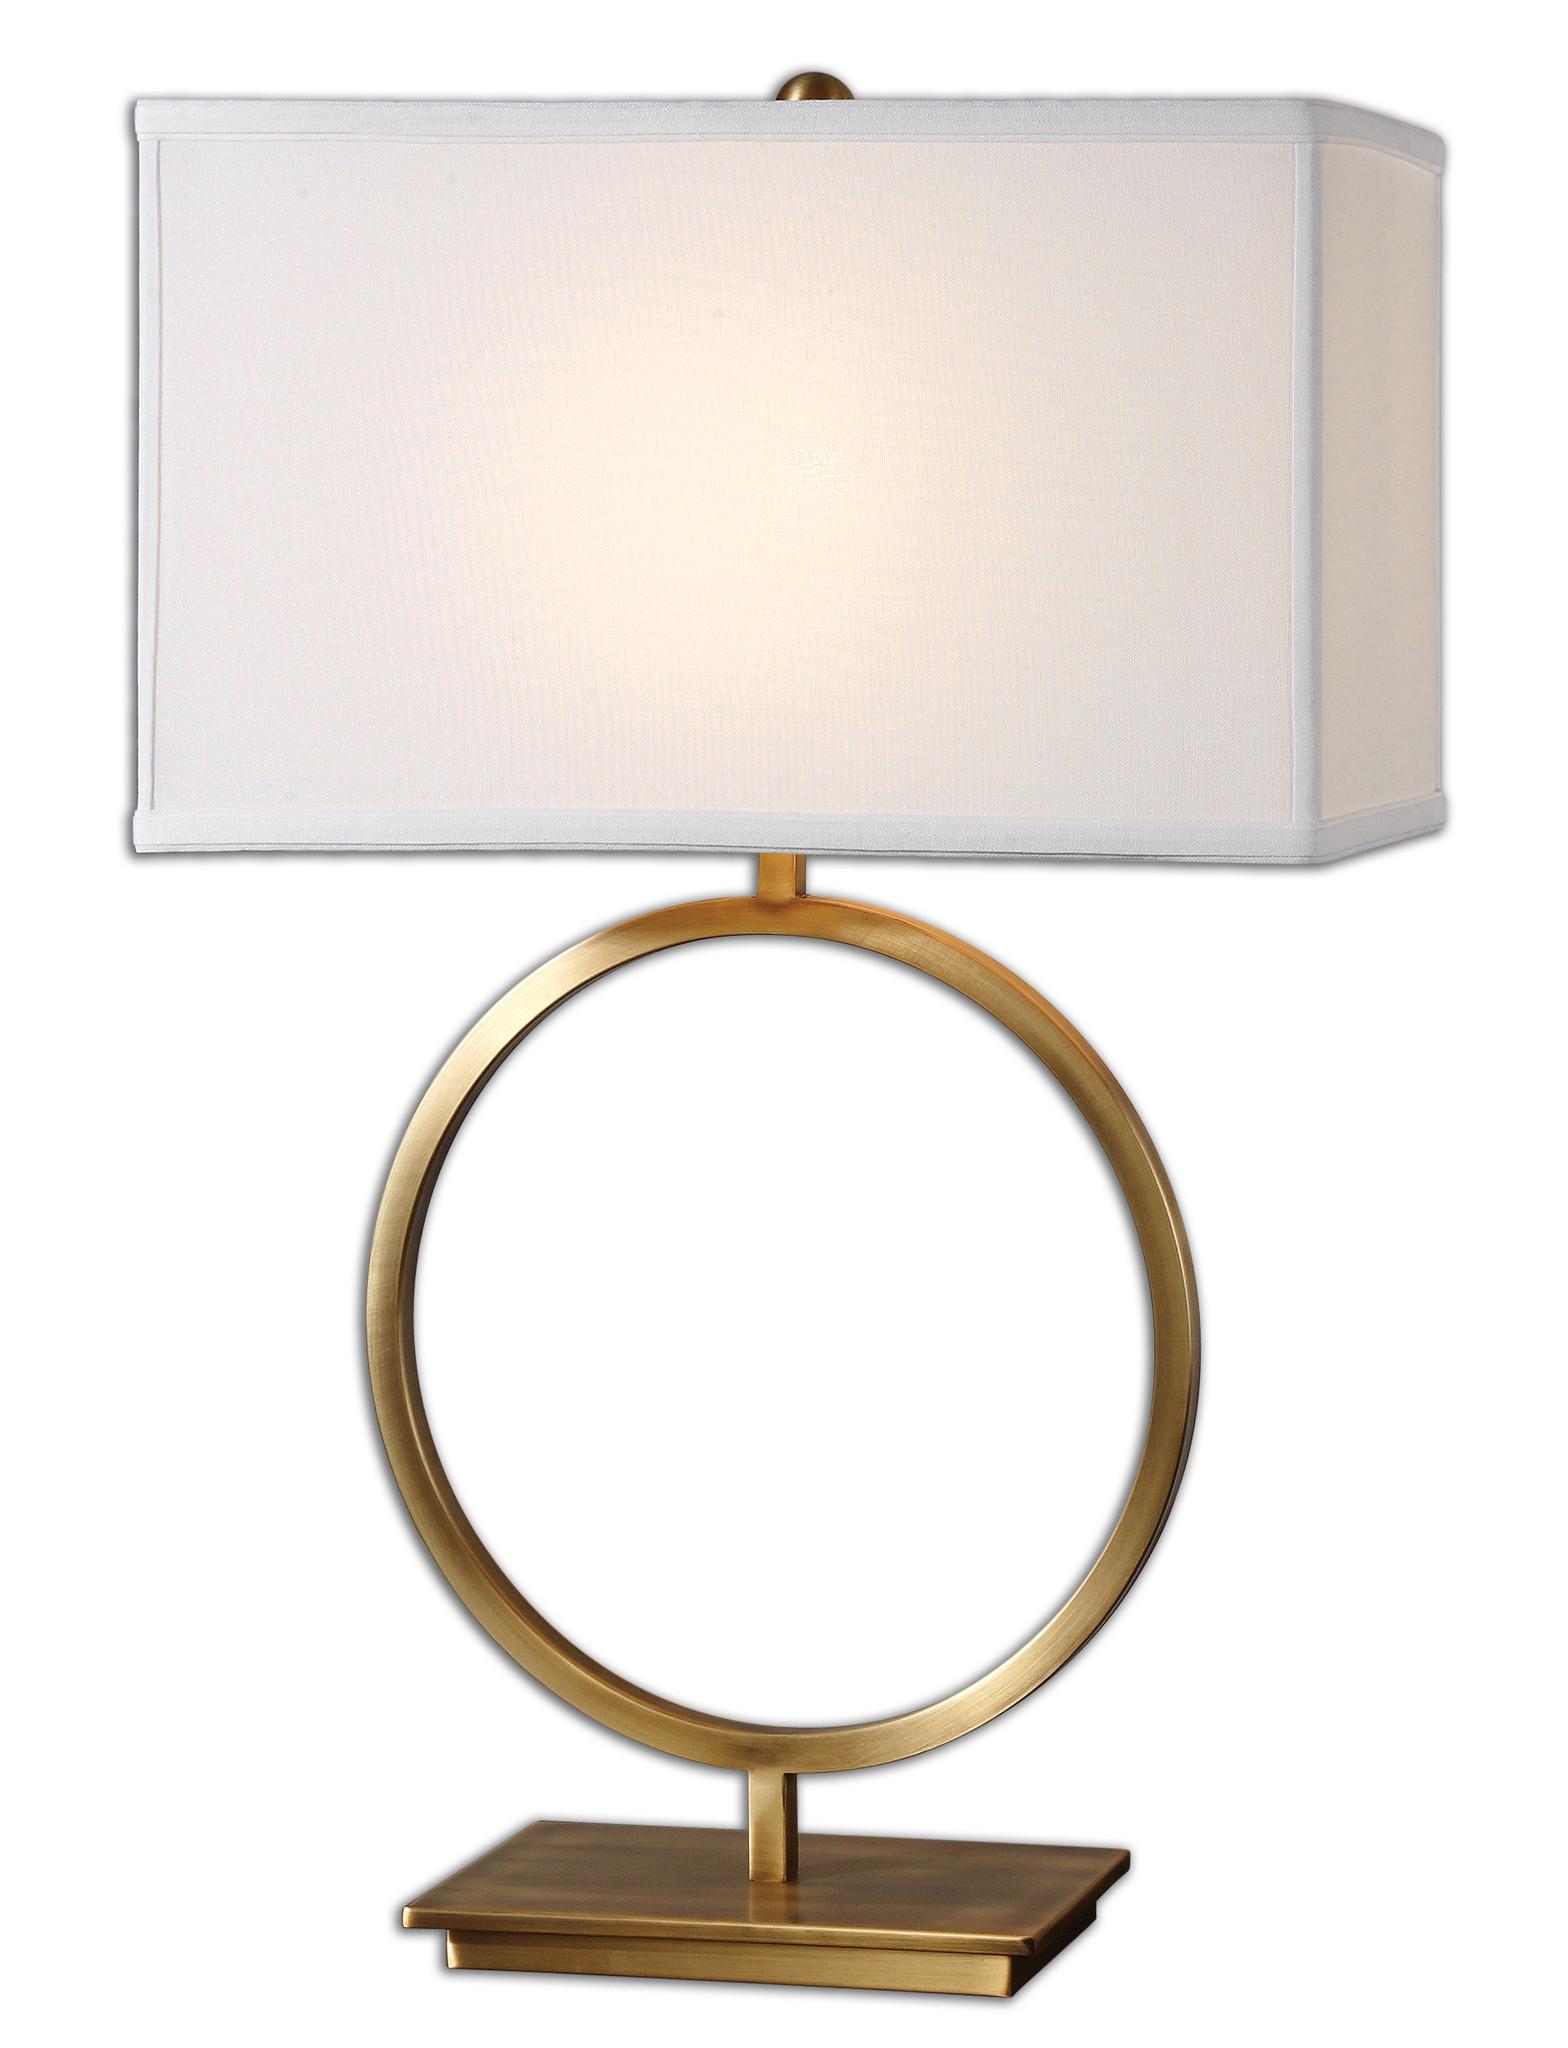 circle lamp photo - 7